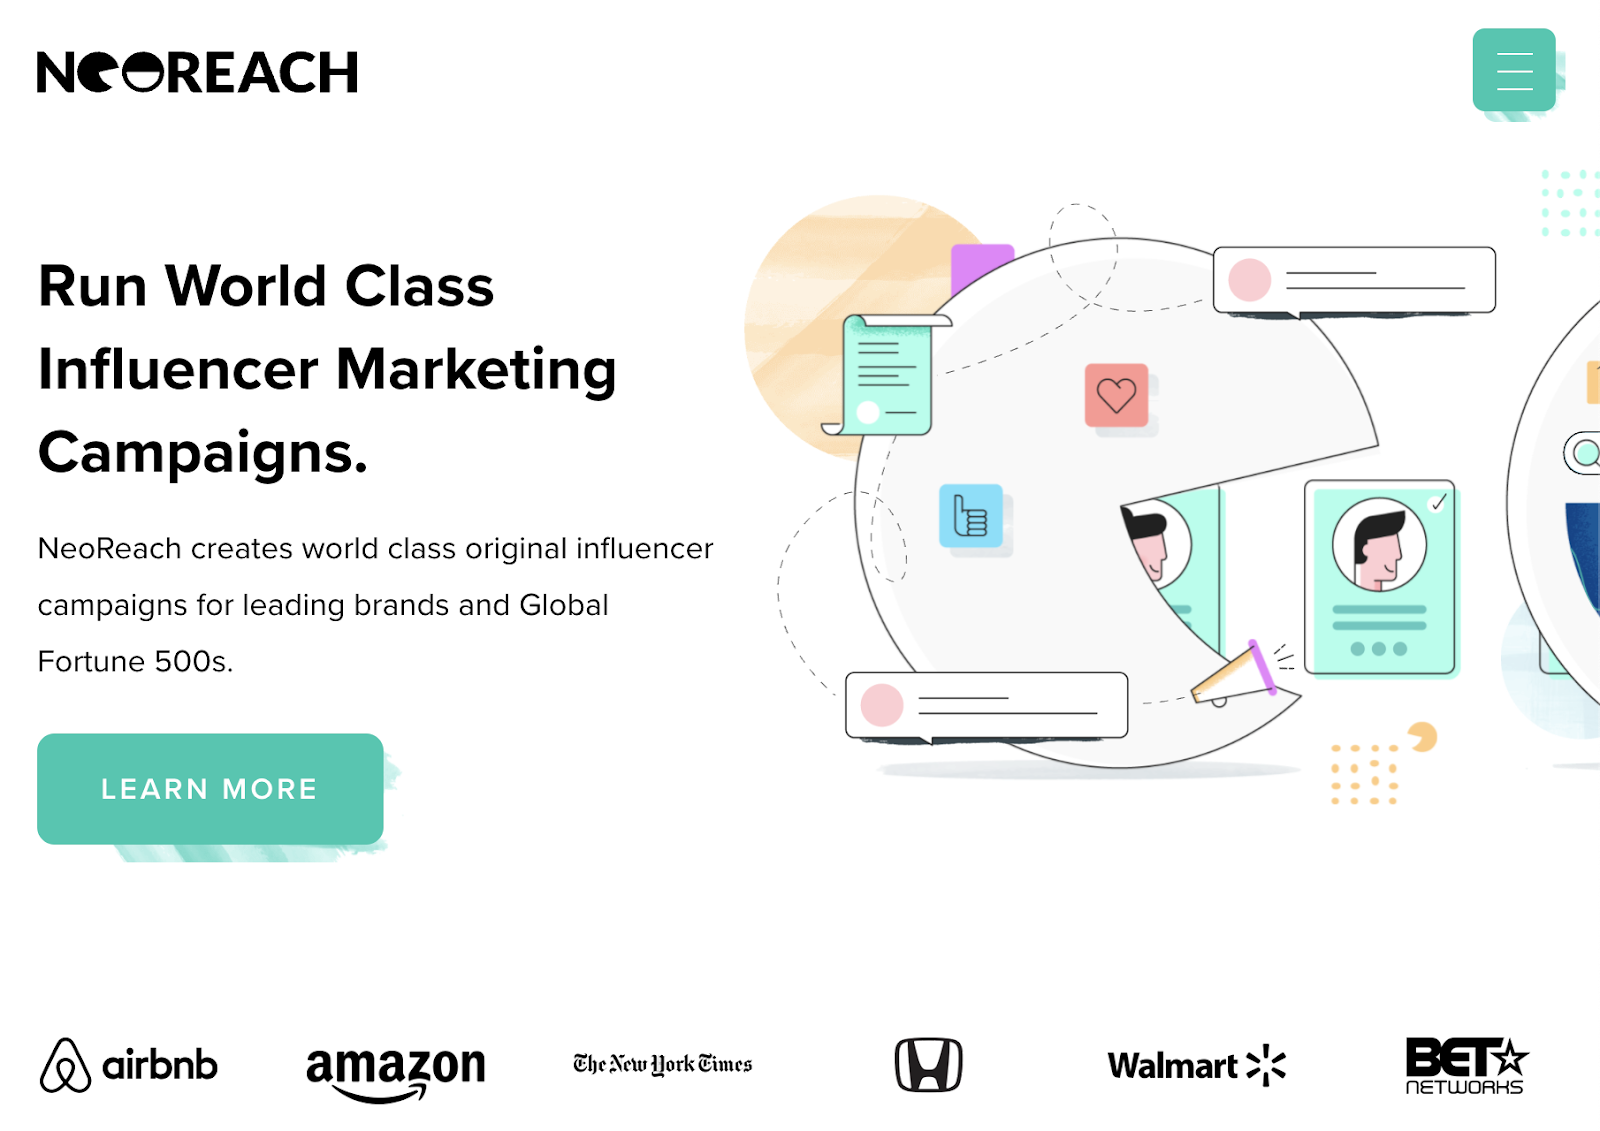 Neoreach influencer marketing